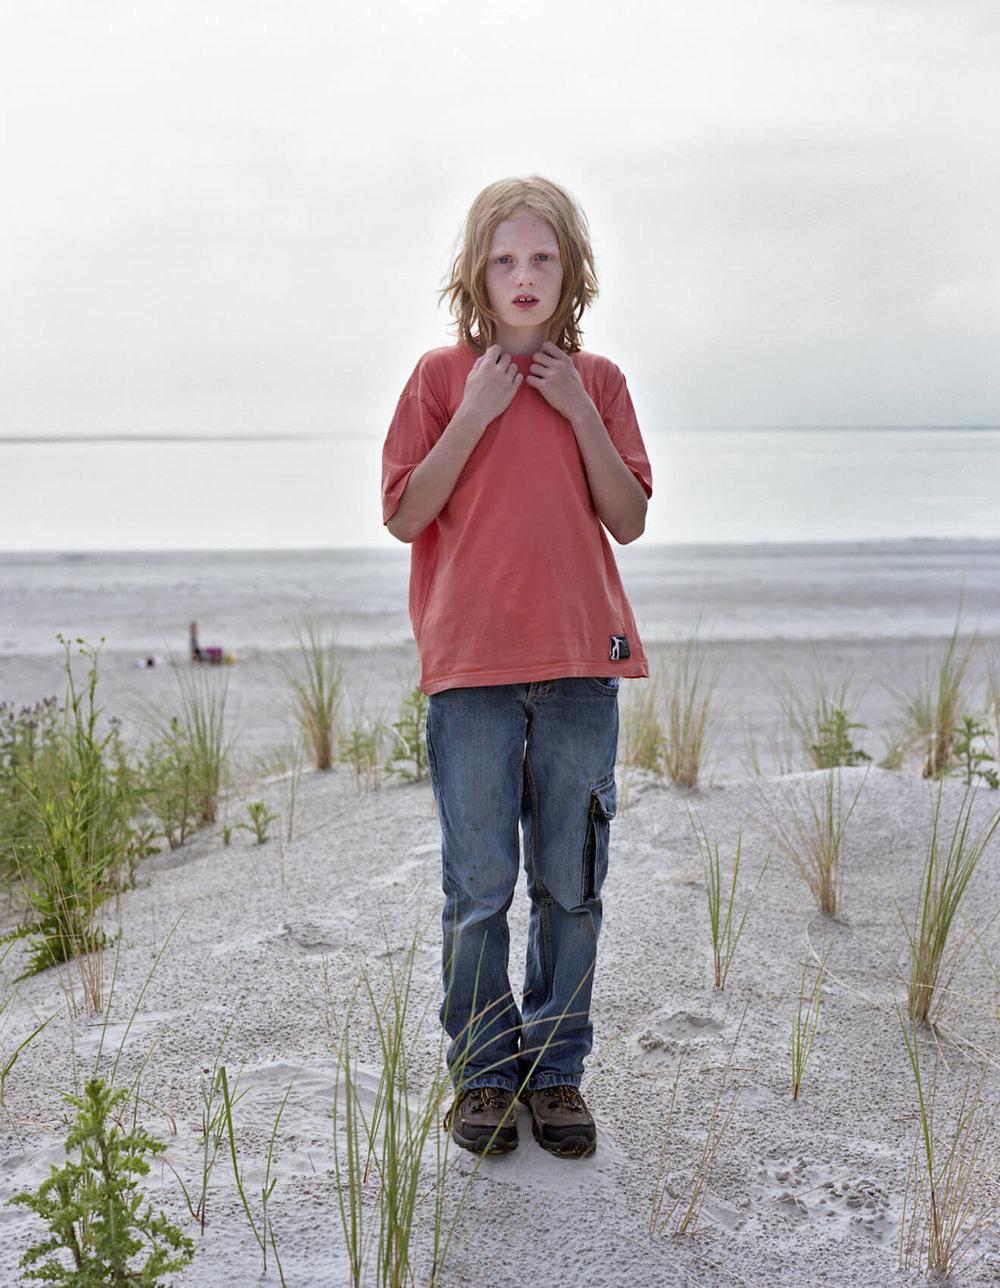 portrait-youth-freedom-expression. copy.jpg